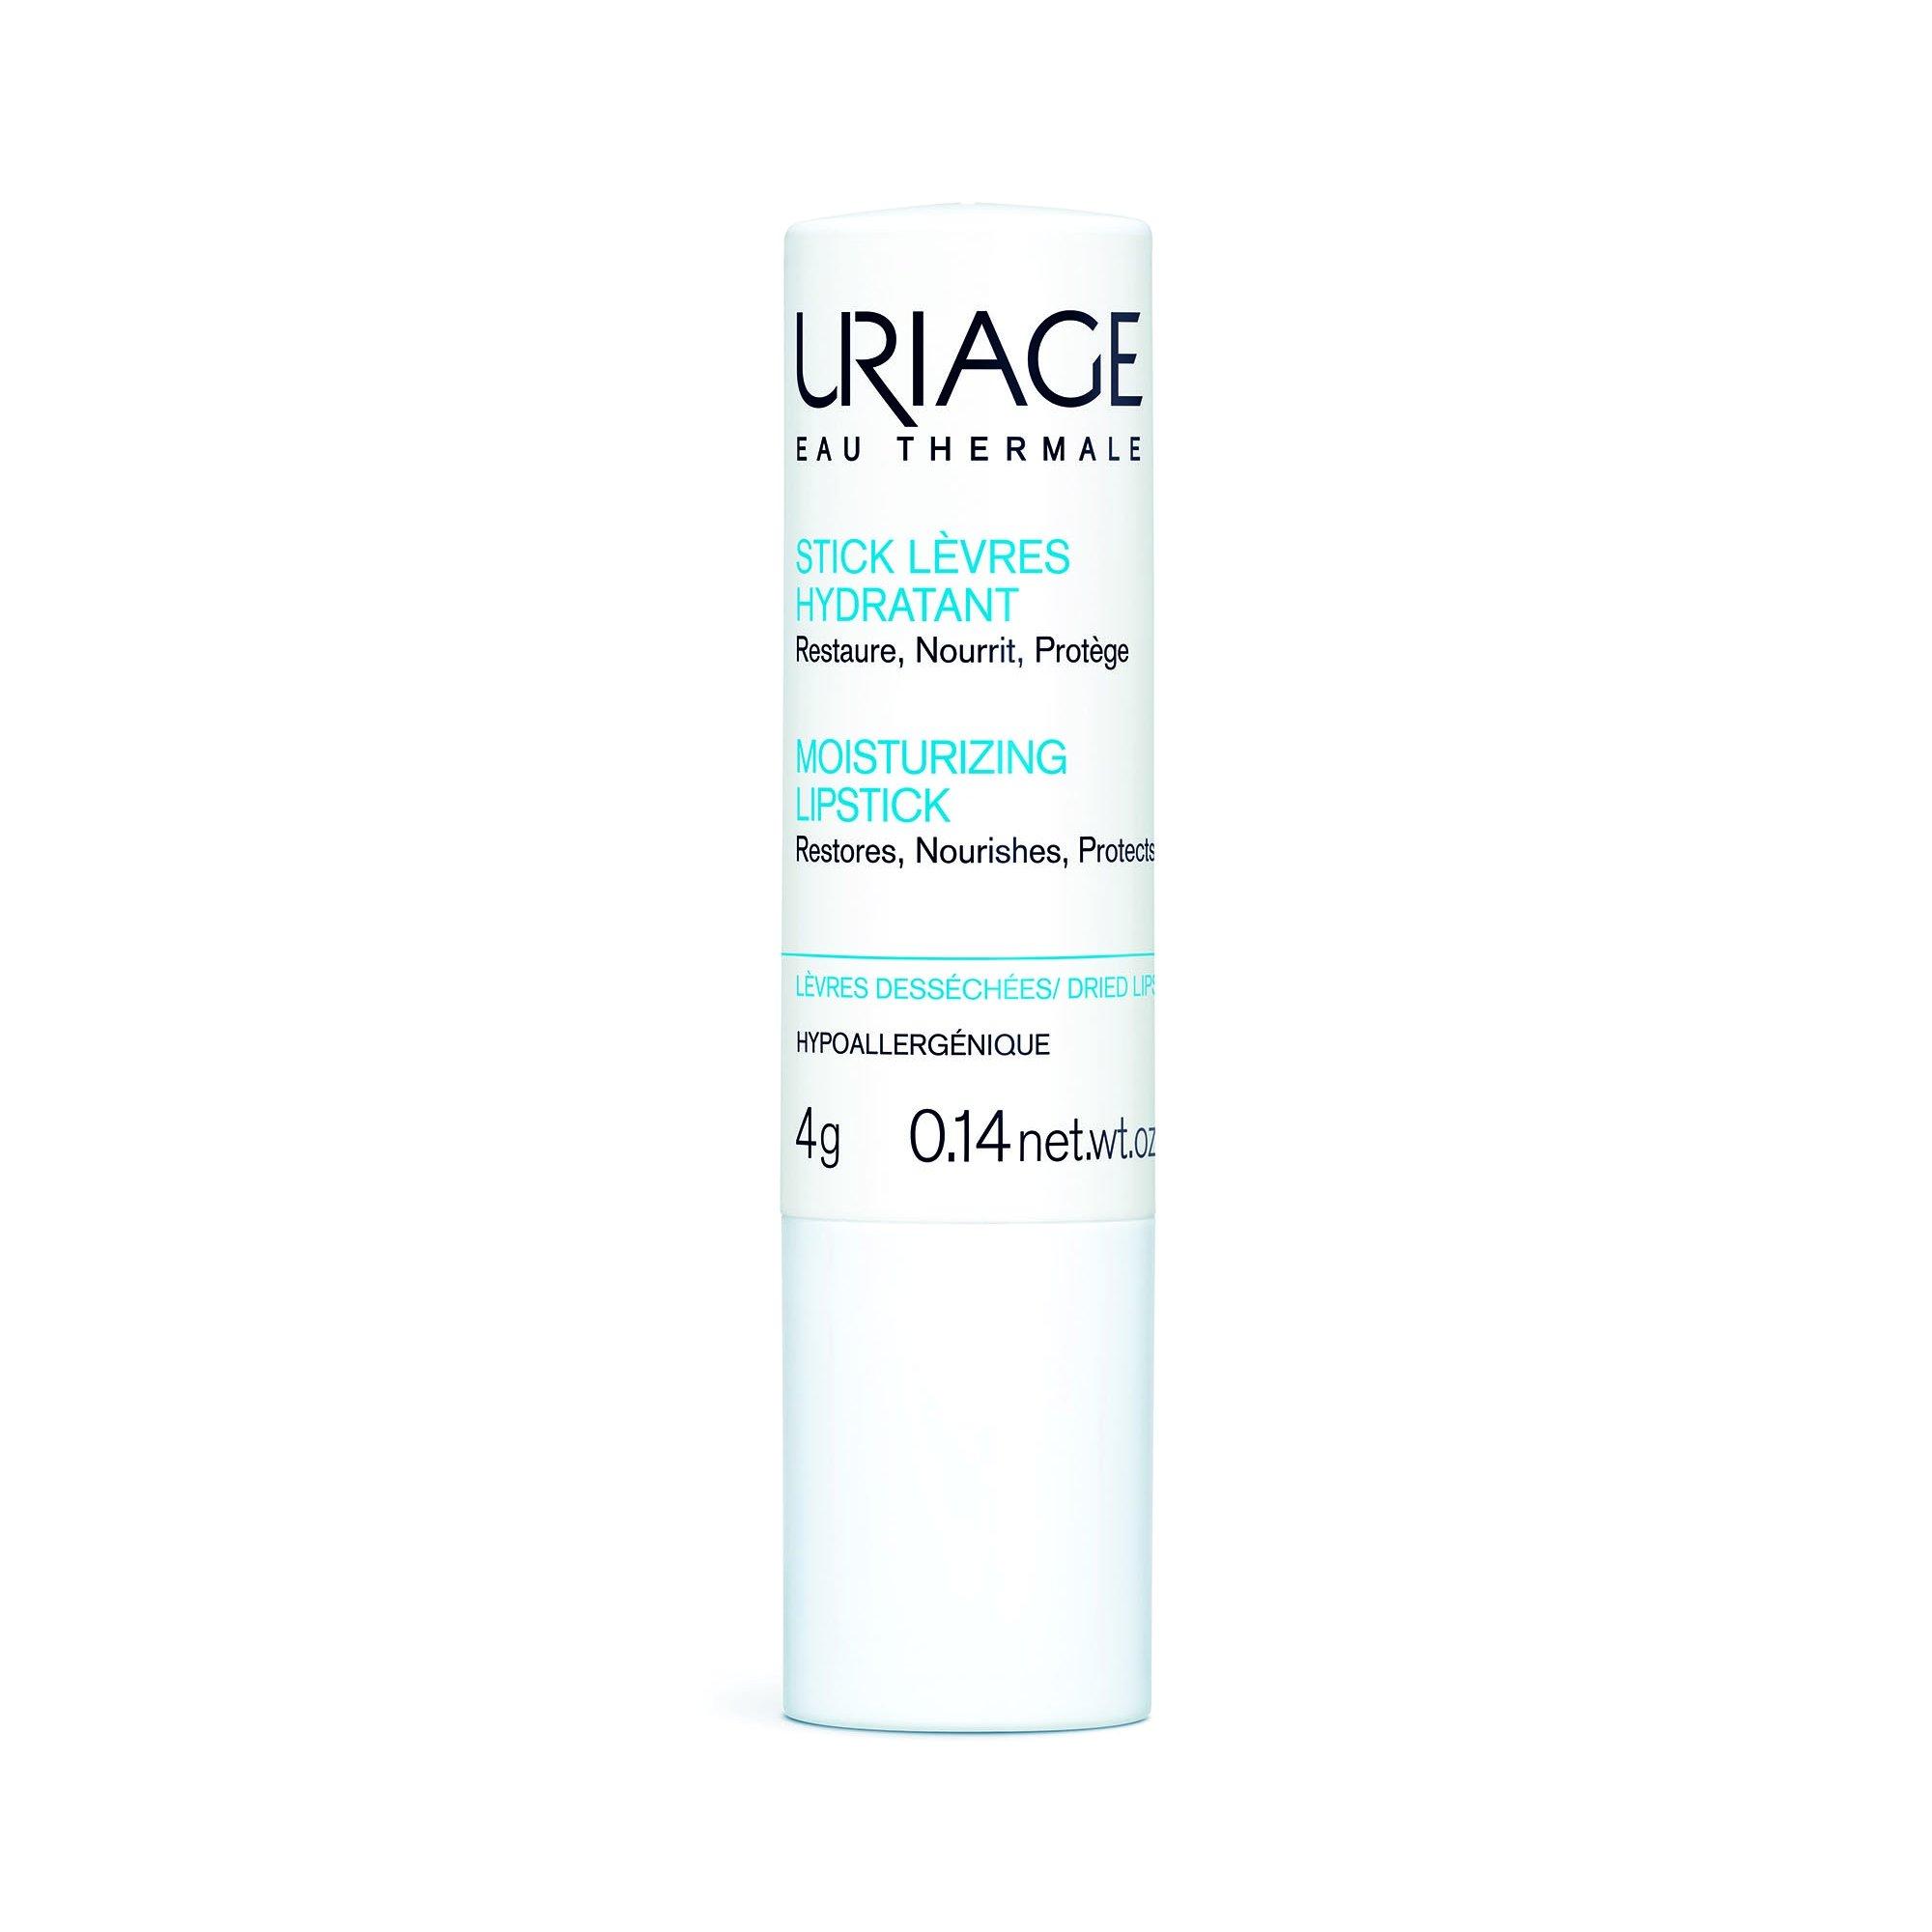 Uriage Eau Thermale Moisturizing Lipstick Ενυδατικό Στικ Για Τα Χείλη 4gr